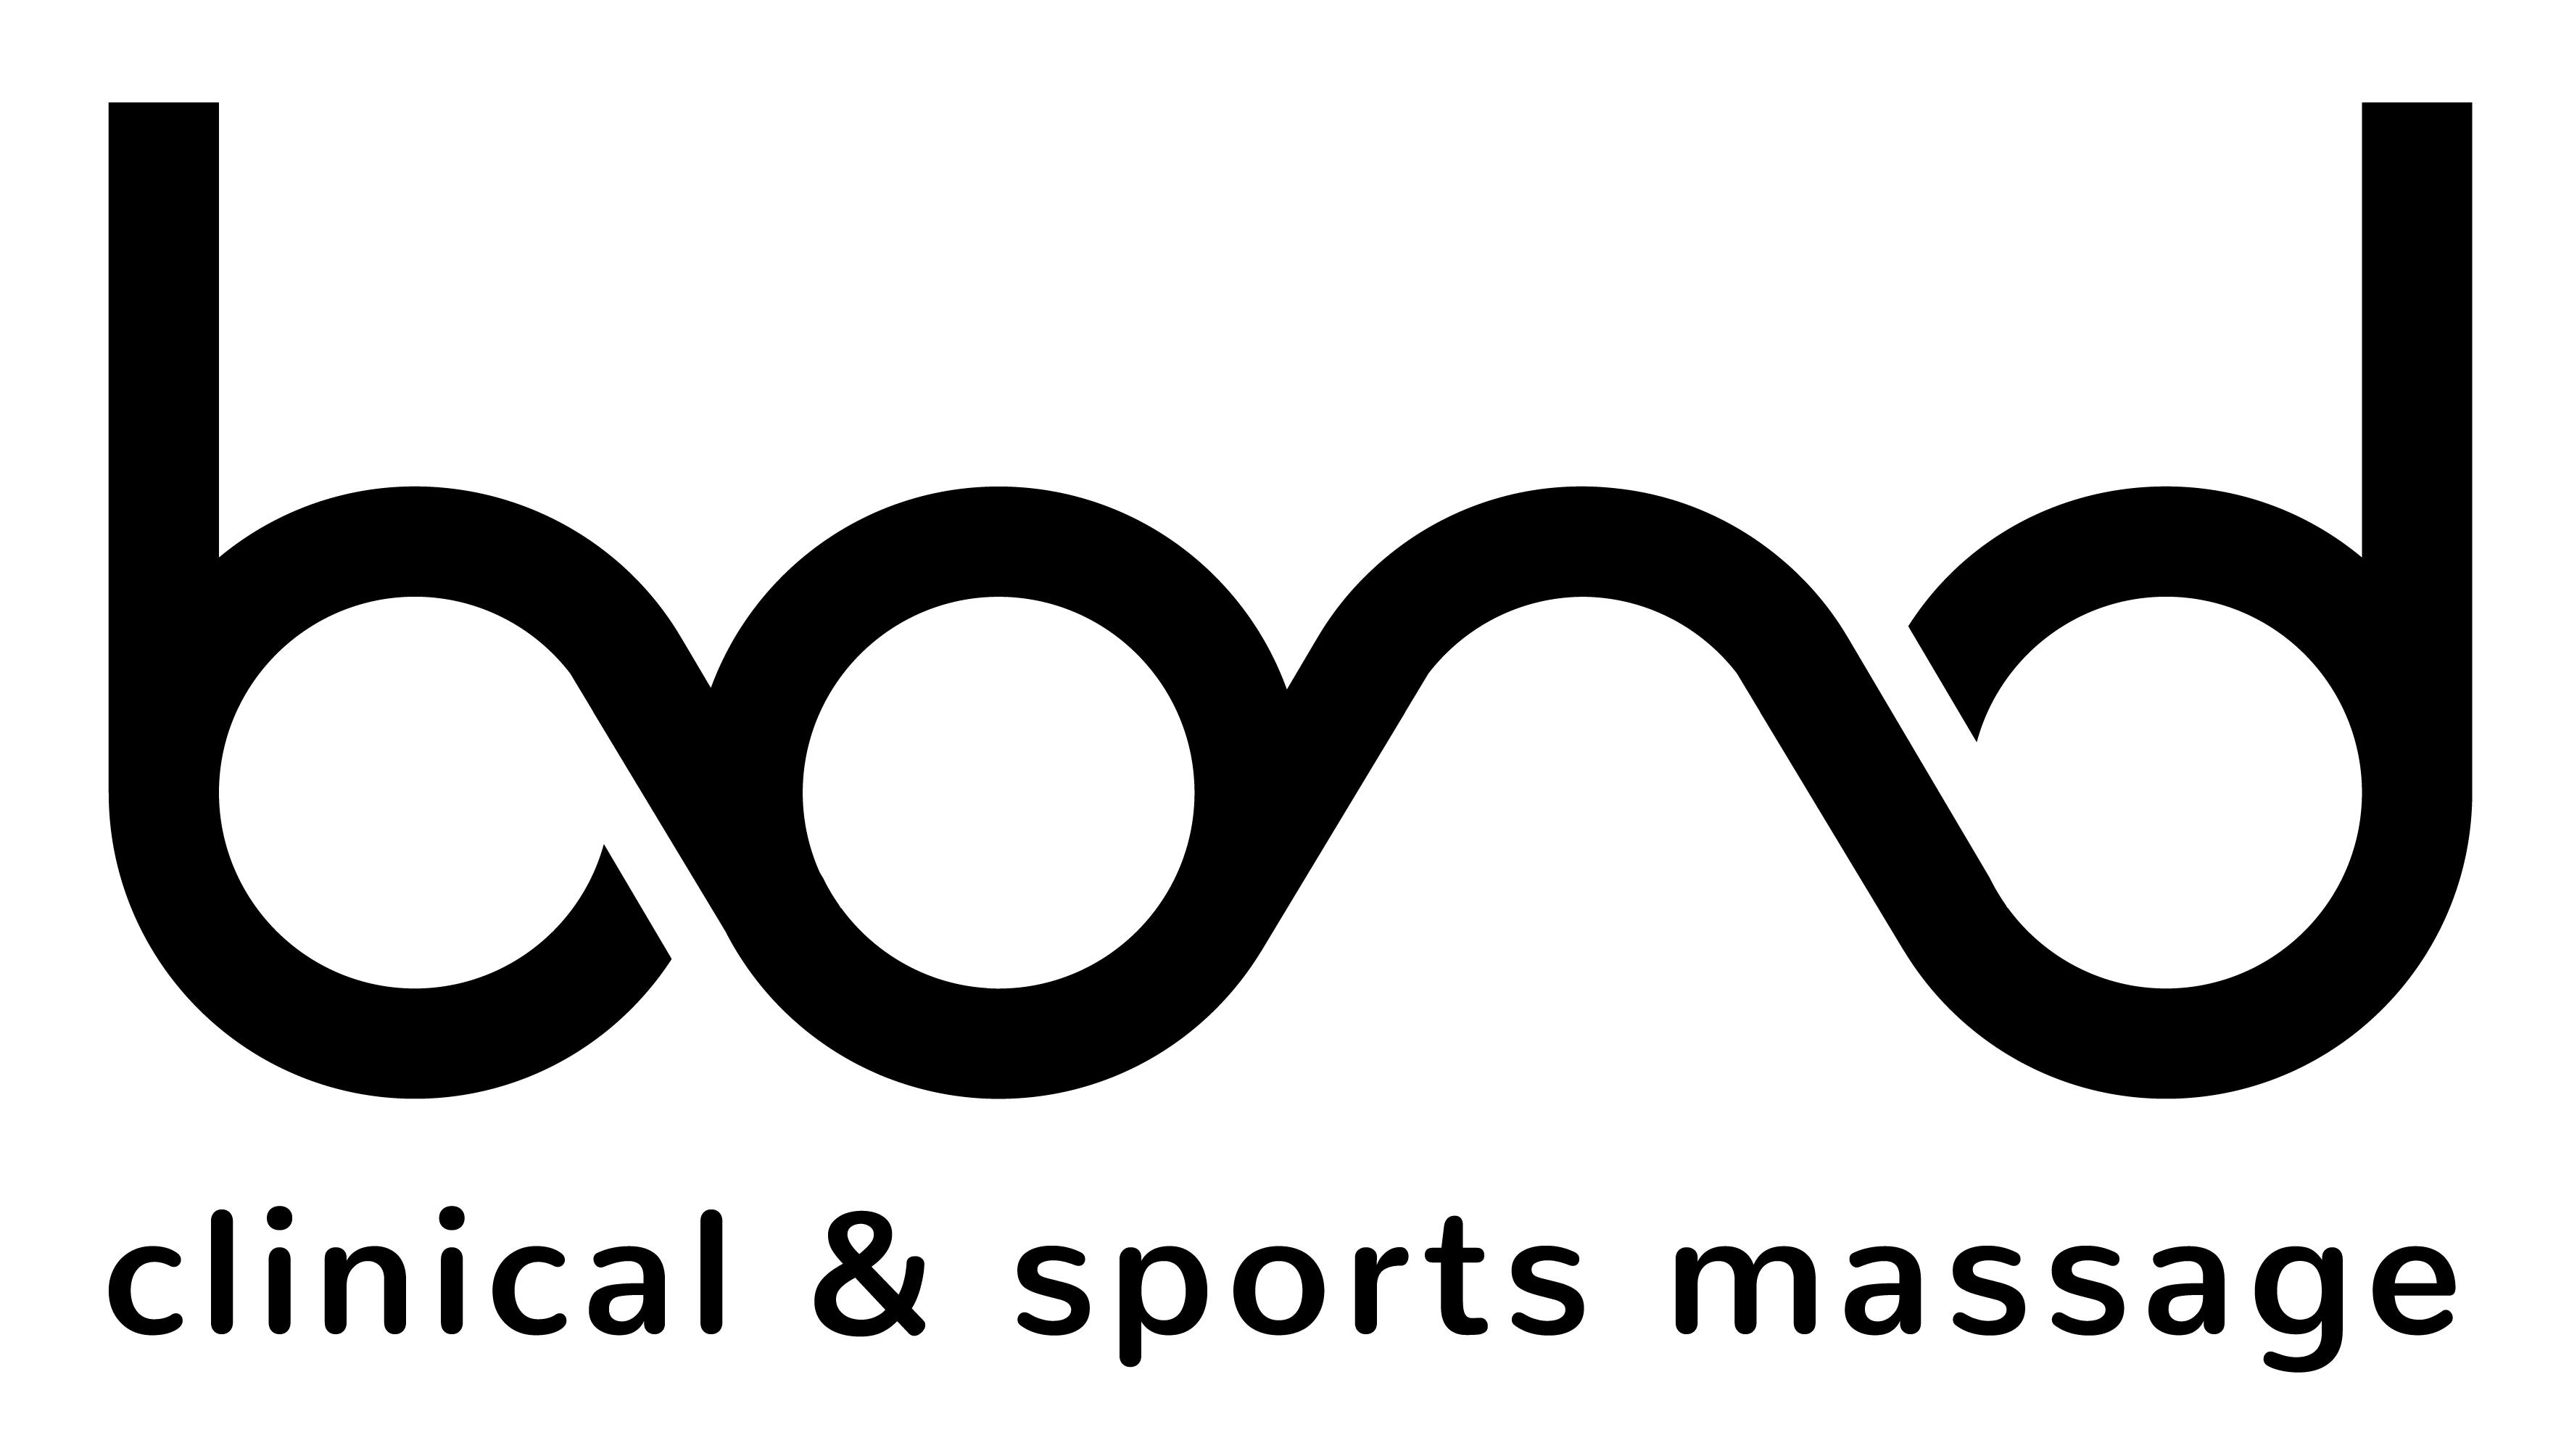 Bond Clinical & Sports Massage